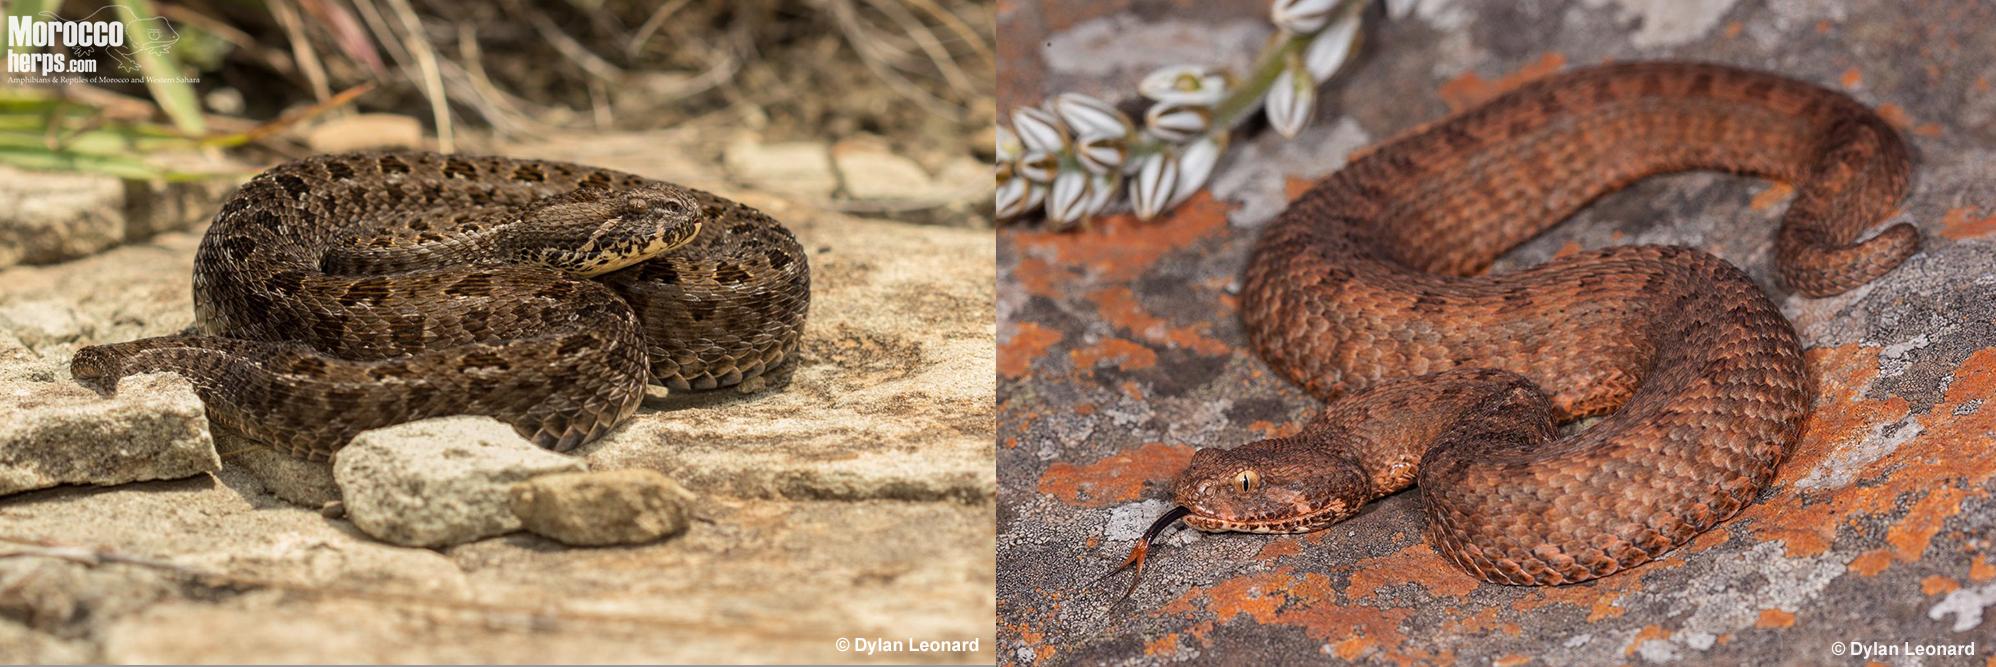 Bitis-atropos-Drakensberg-Mpumalanga-variability-pattern